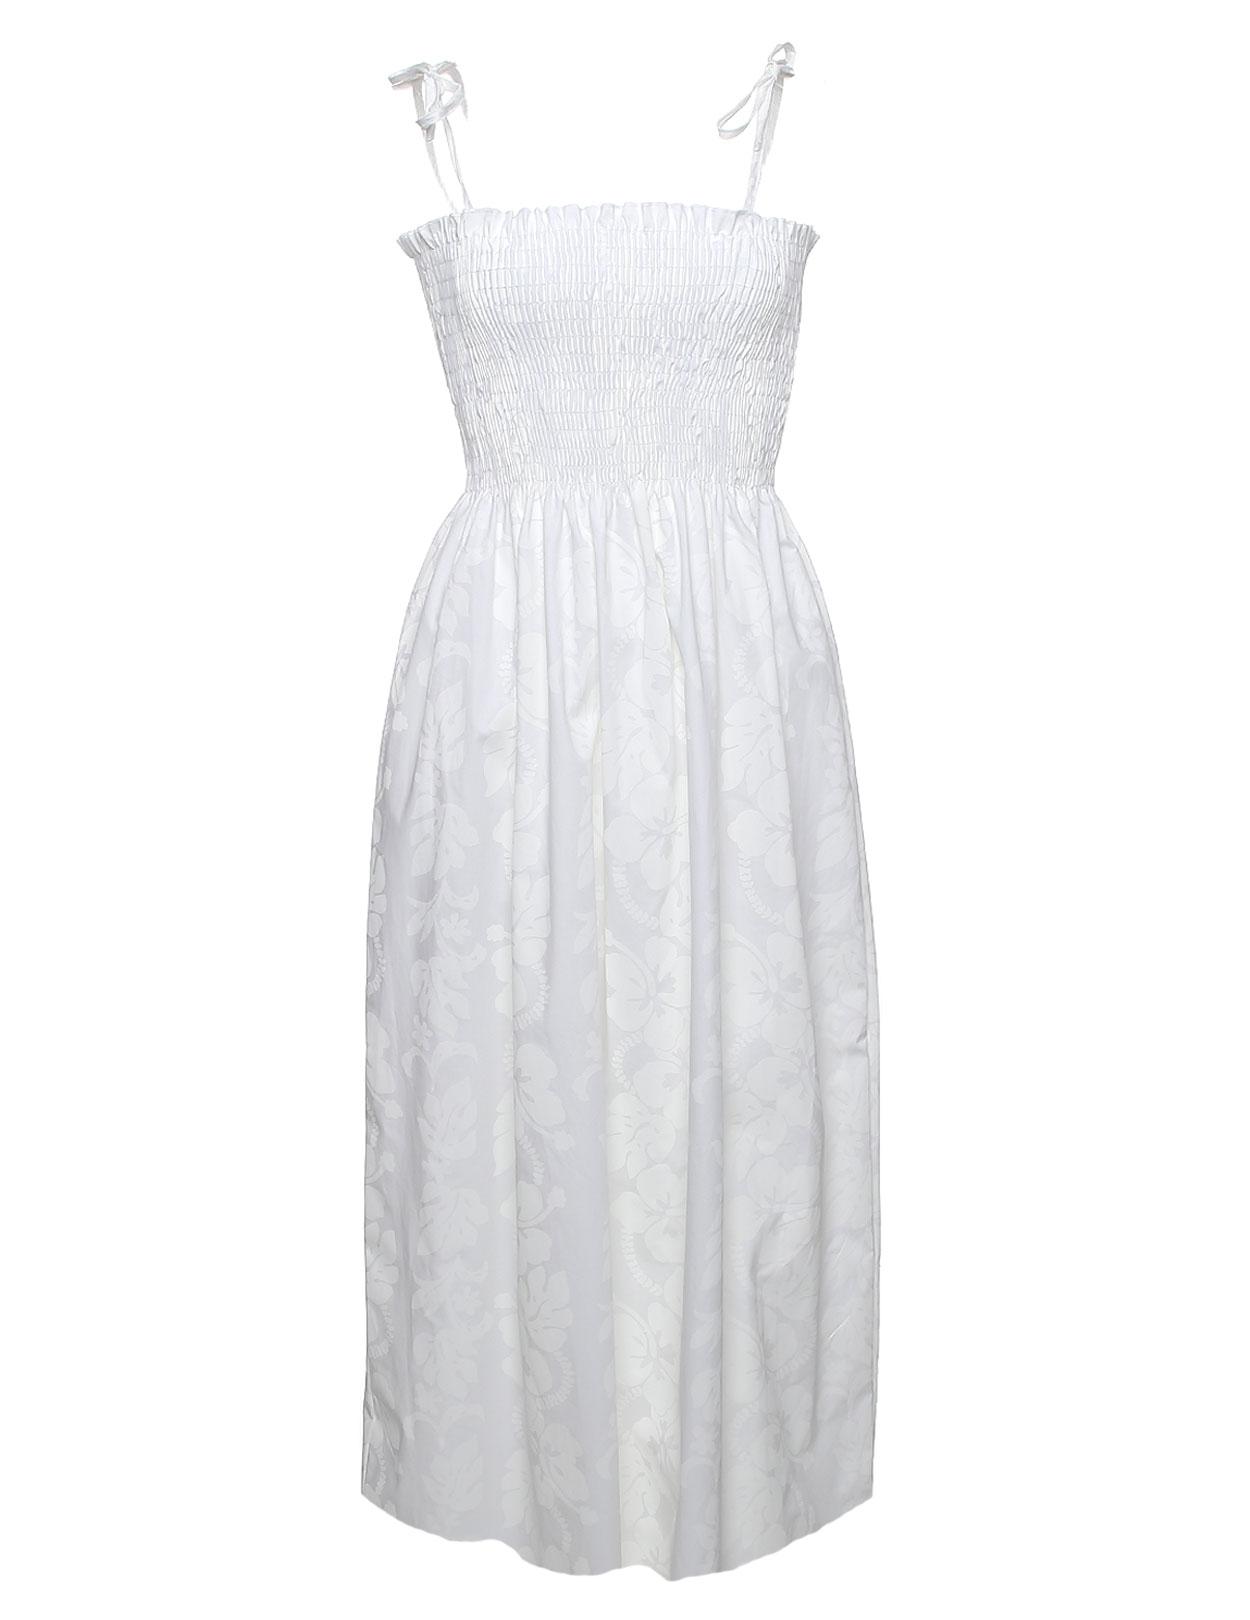 Hibiscus Lei Smock Top White Hawaiian Wedding Dress Shaka Time